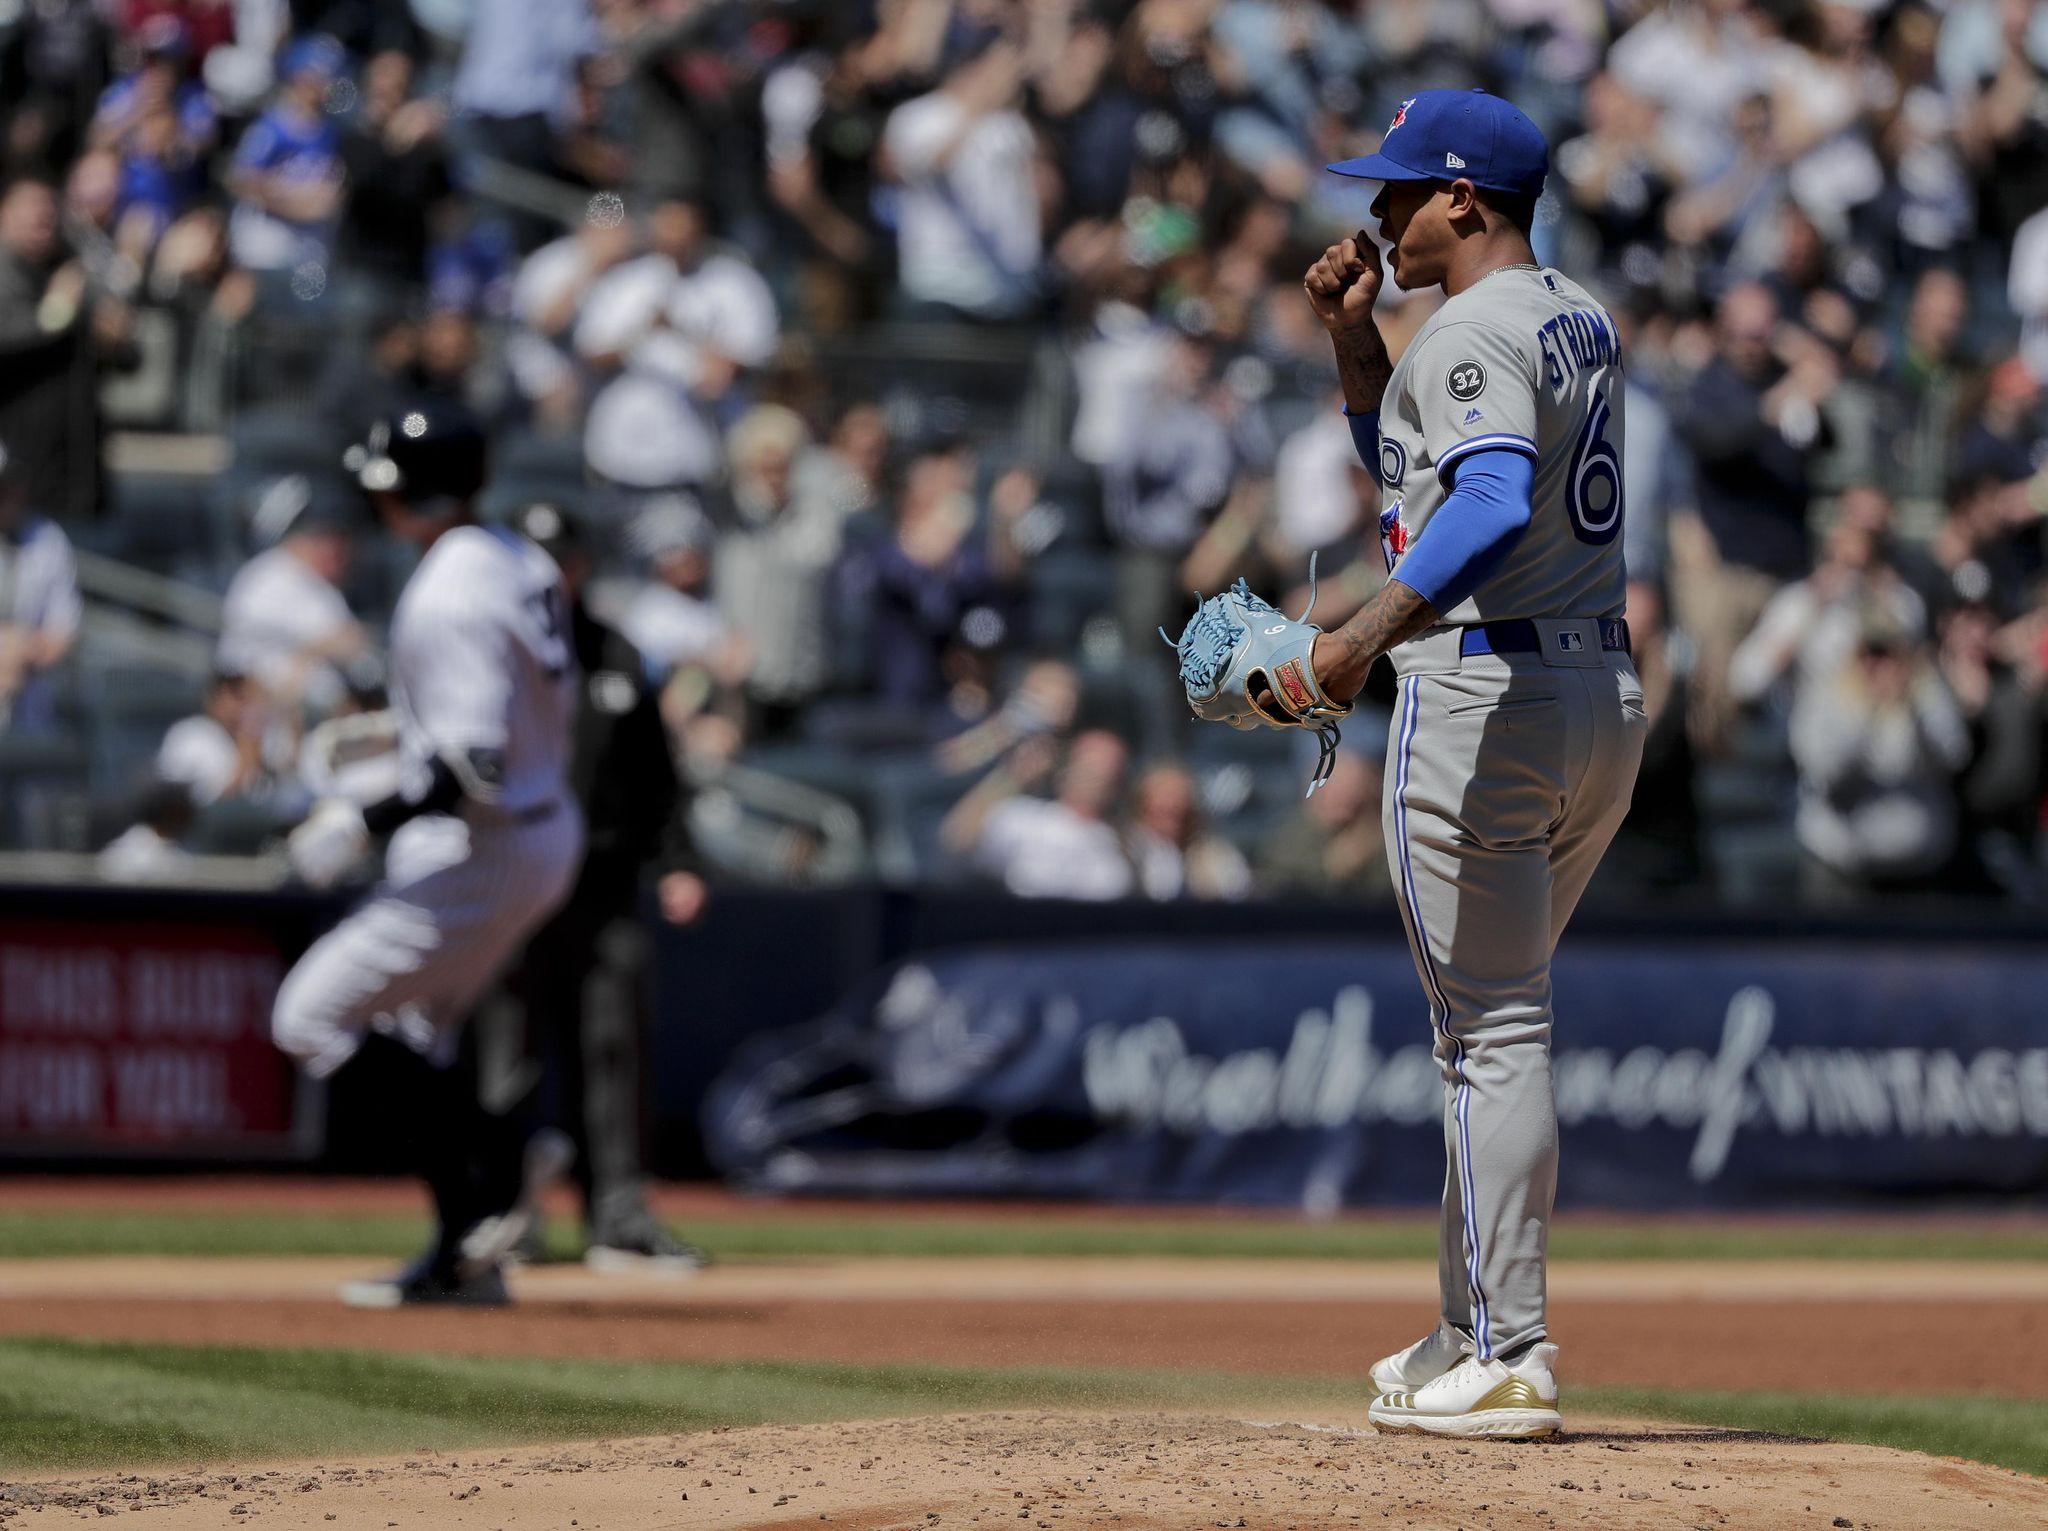 Blue_jays_yankees_baseball_82452_s2048x1531